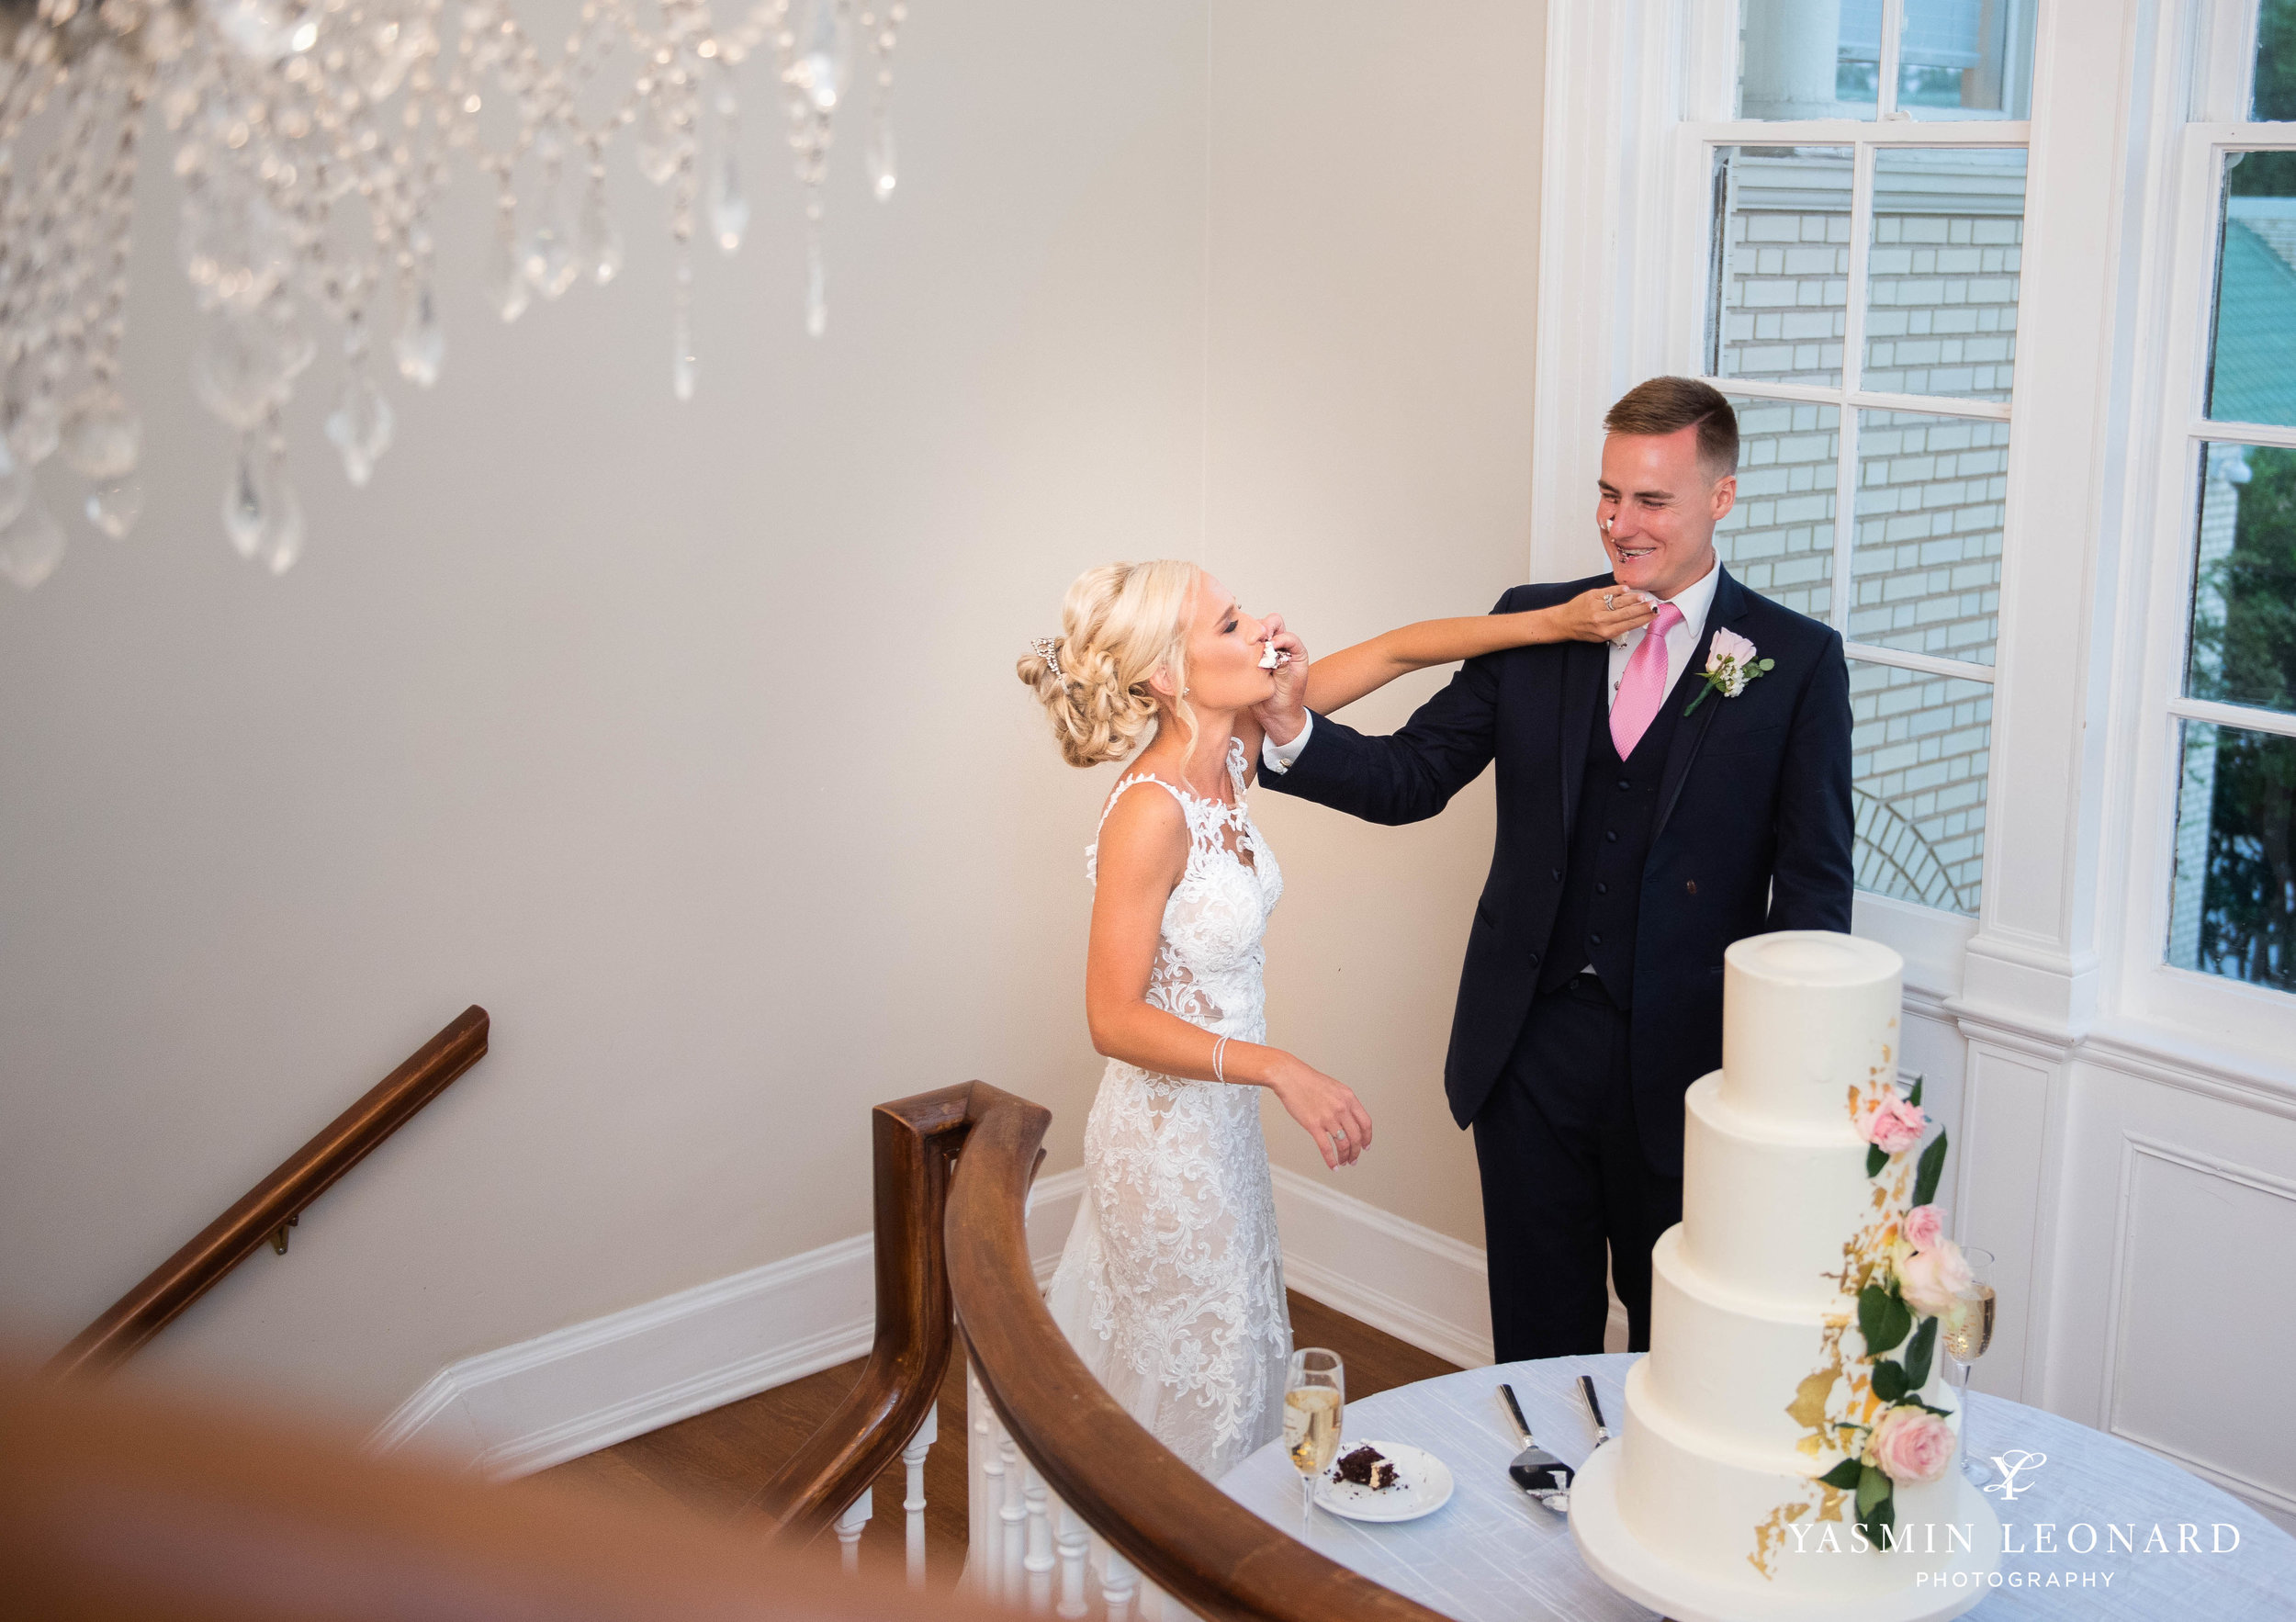 Separk Mansion - NC Weddings - Gastonia Wedding - NC Wedding Venues - Pink and Blue Wedding Ideas - Pink Bridesmaid Dresses - Yasmin Leonard Photography-58.jpg